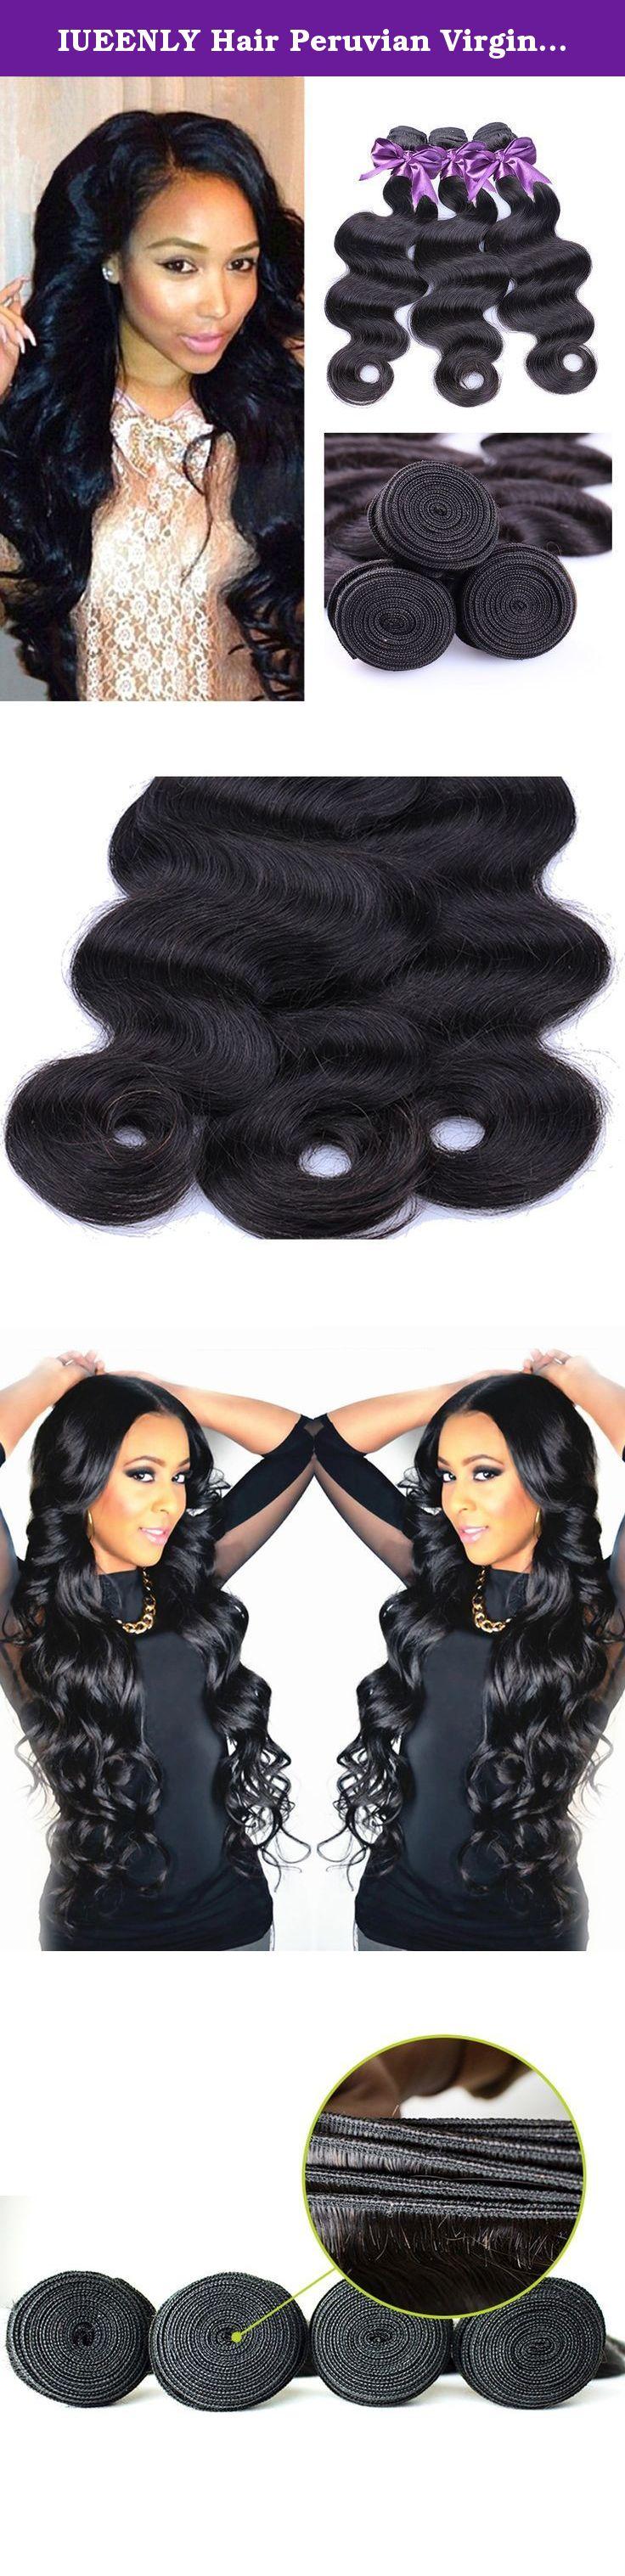 Iueenly hair peruvian virgin hair body wave bundles grade a